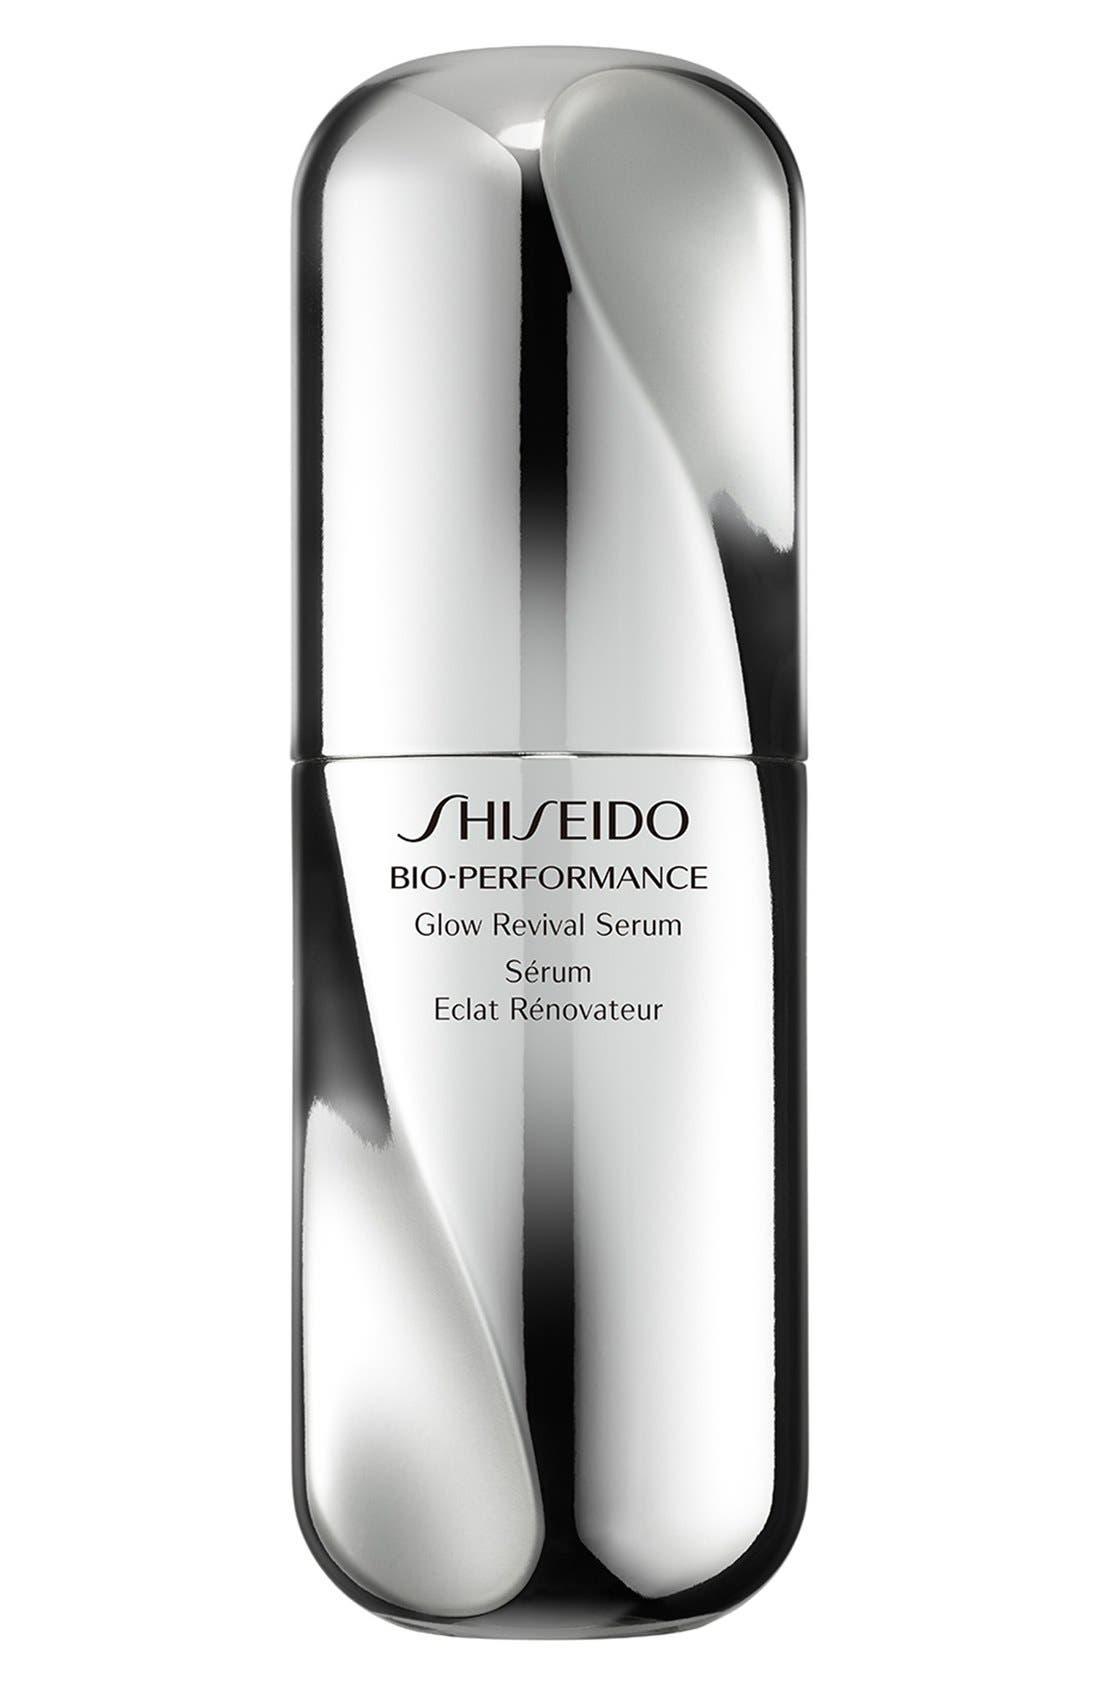 Shiseido 'Bio-Performance' Glow Revival Serum